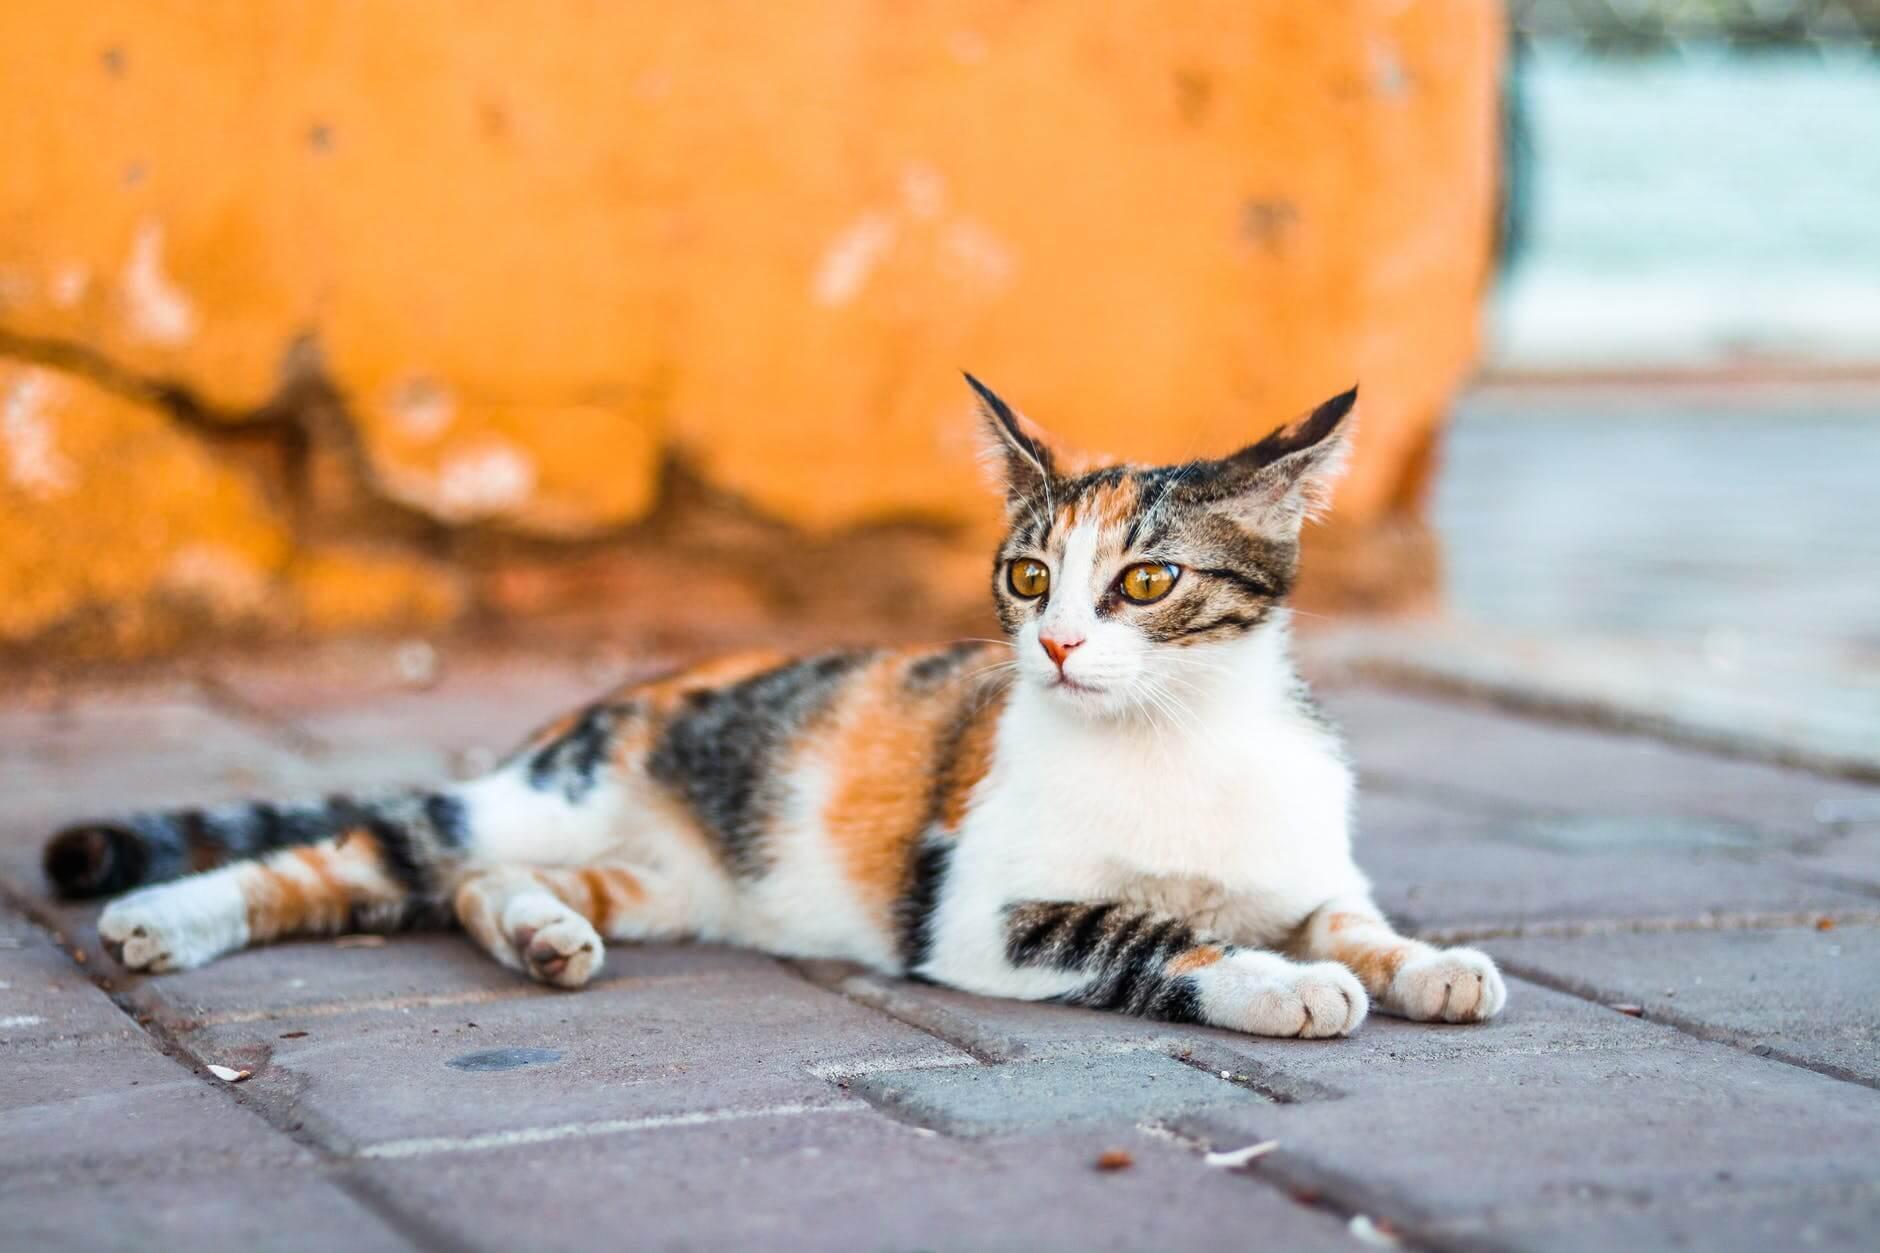 Photo by Hasan Albari on Pexels.com